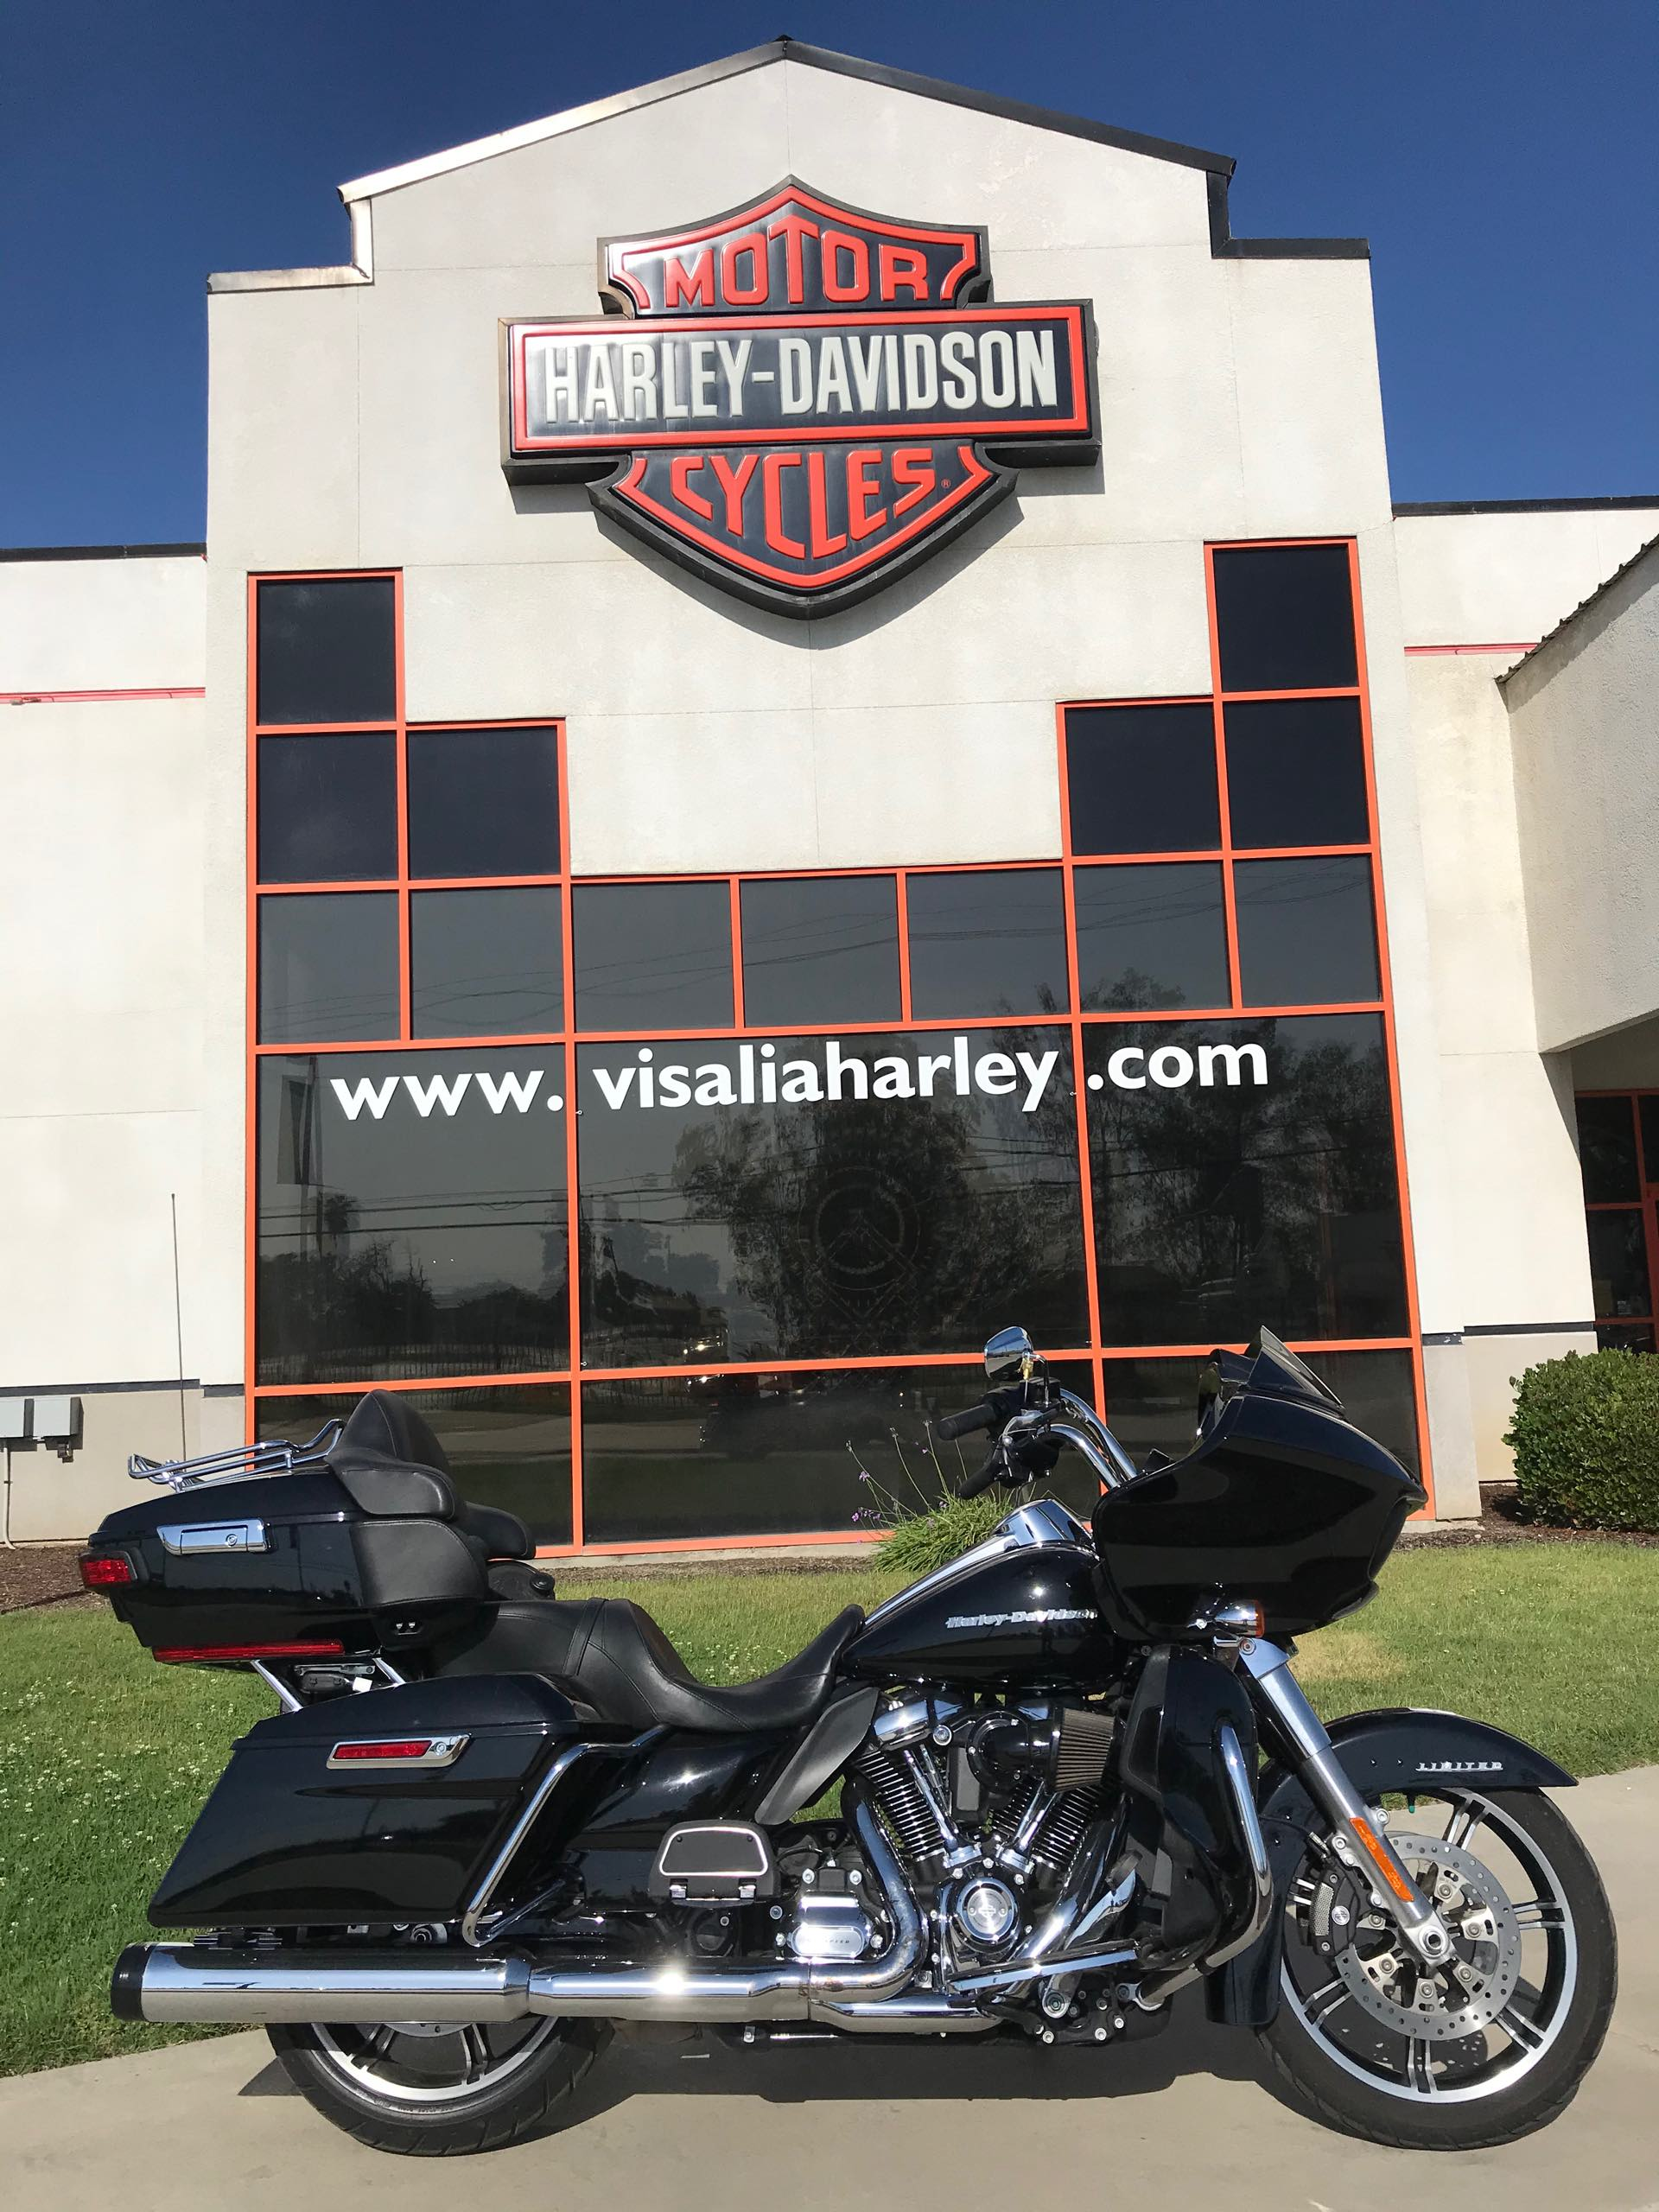 2020 Harley-Davidson Touring Road Glide Limited at Visalia Harley-Davidson